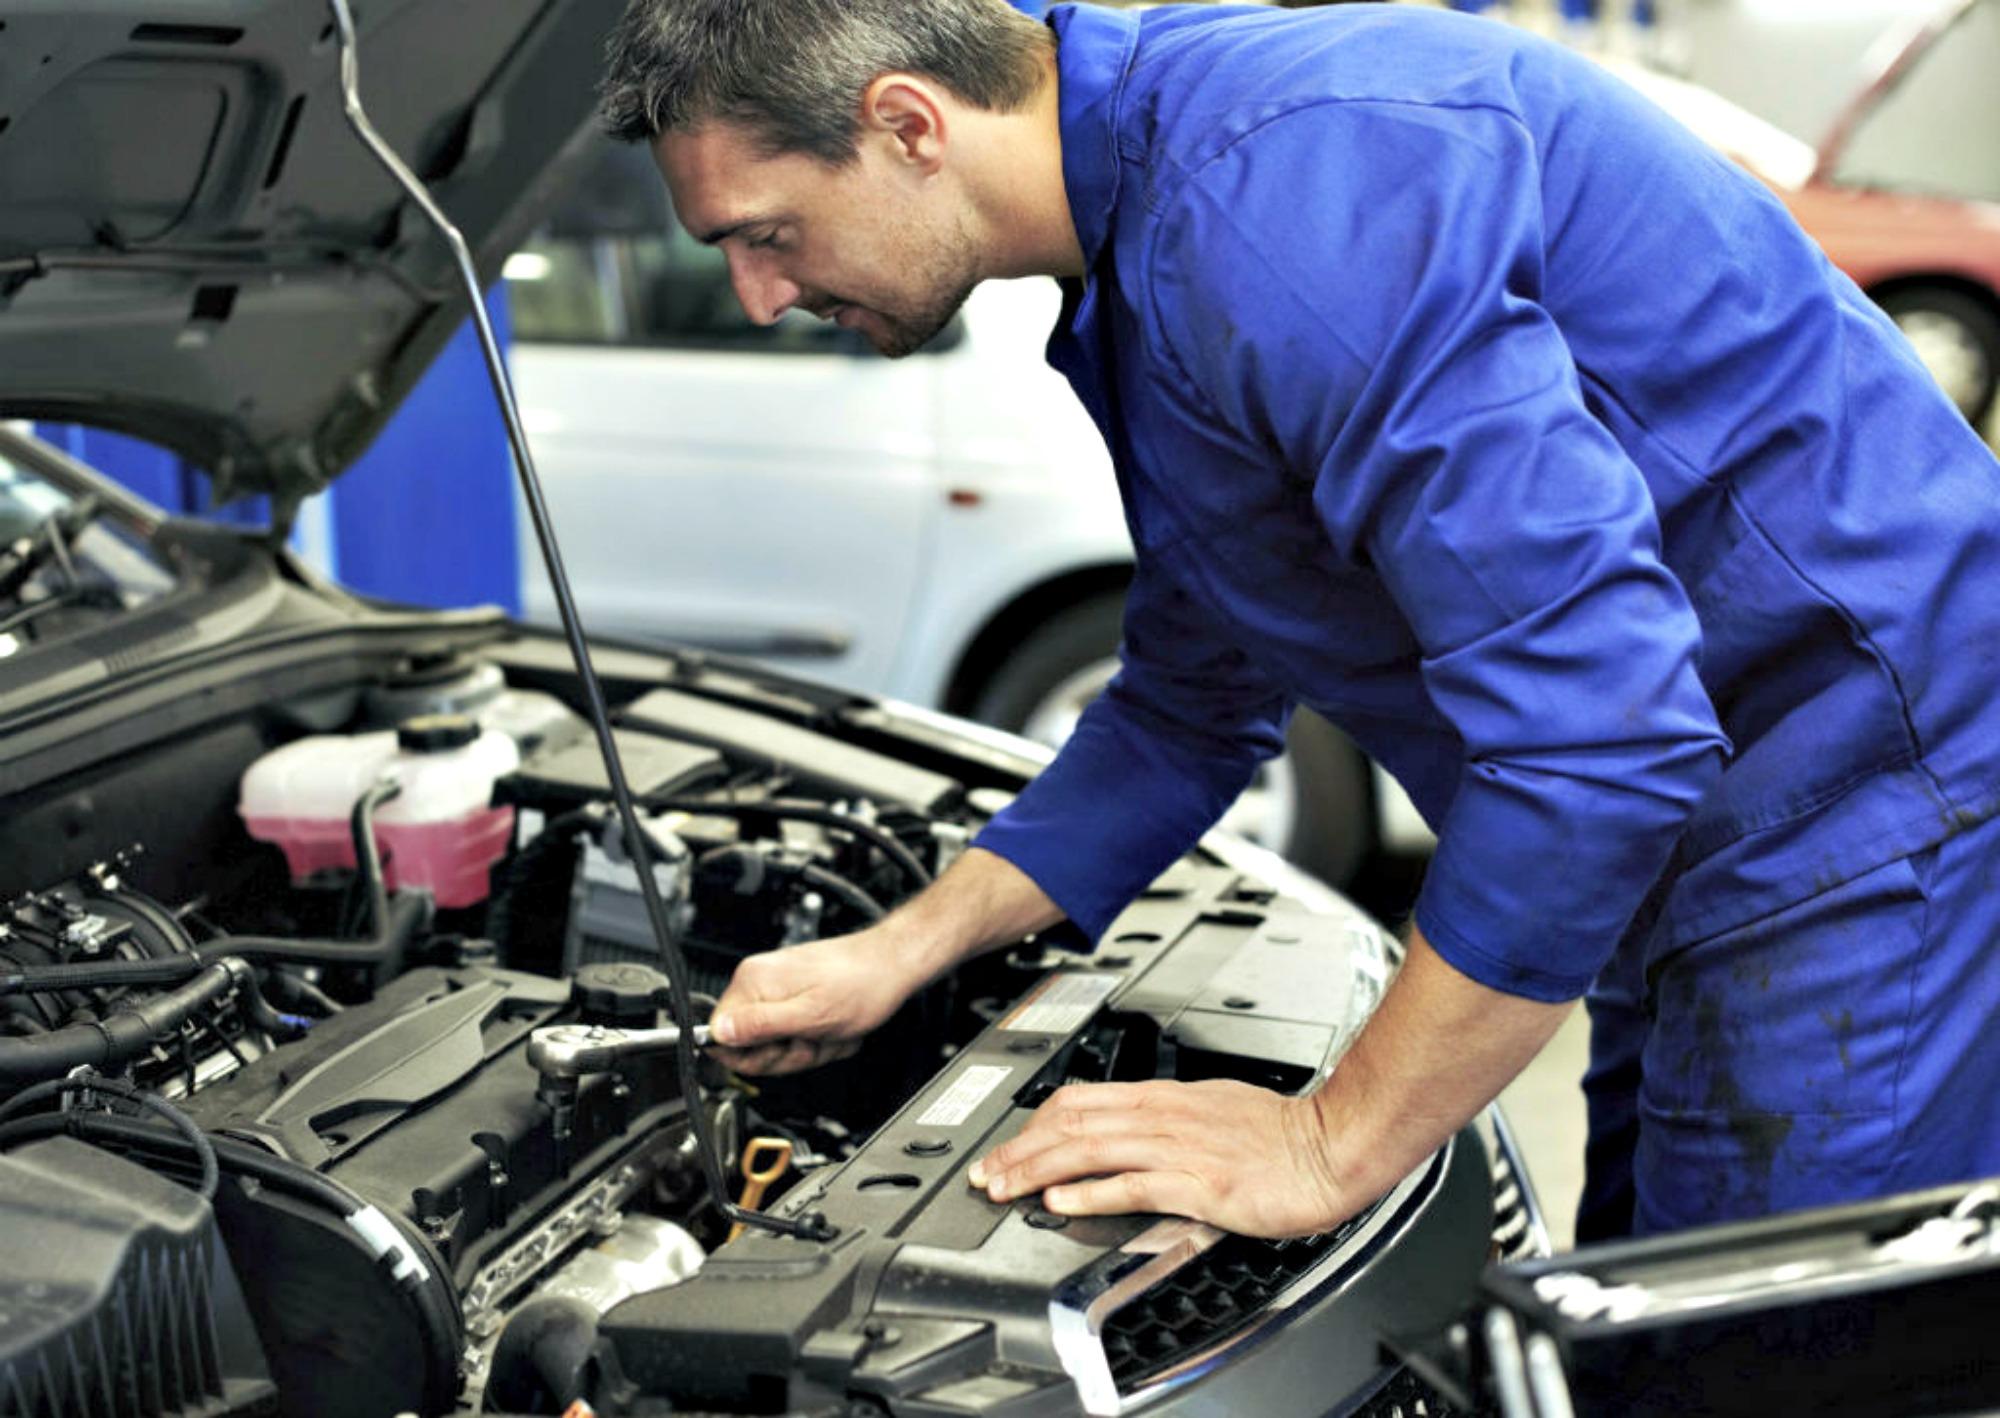 Accidente Automovilistico - mecanico arreglando auto